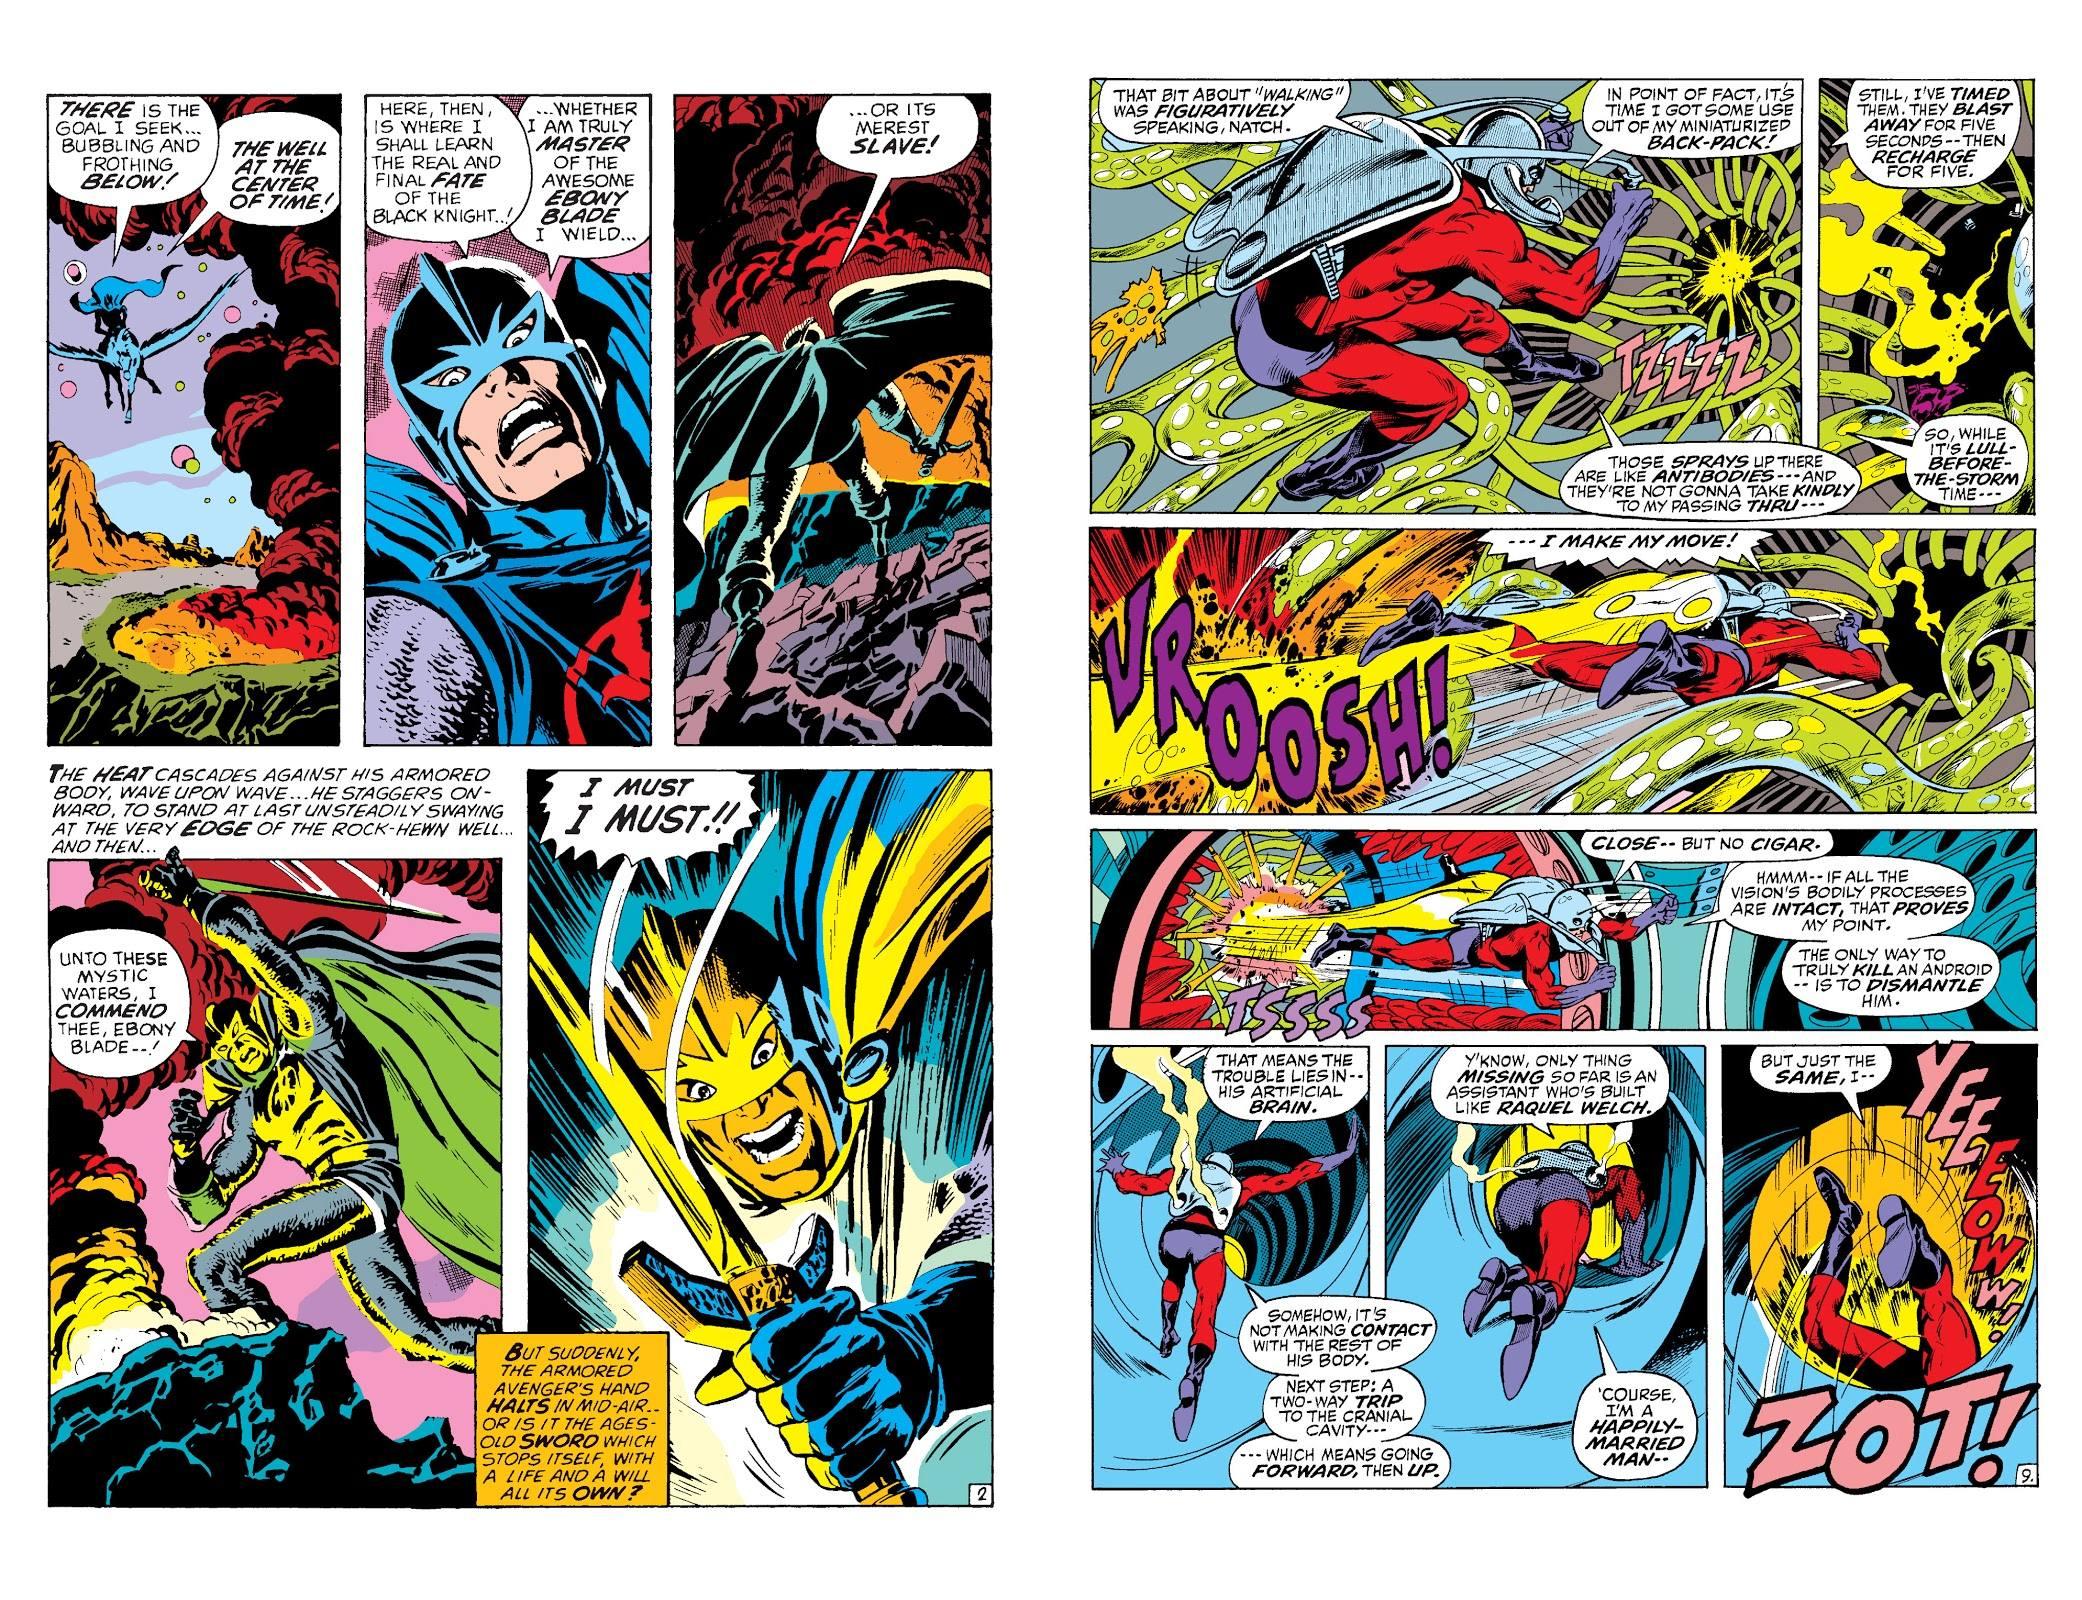 Avengers This Beachhead Earth review